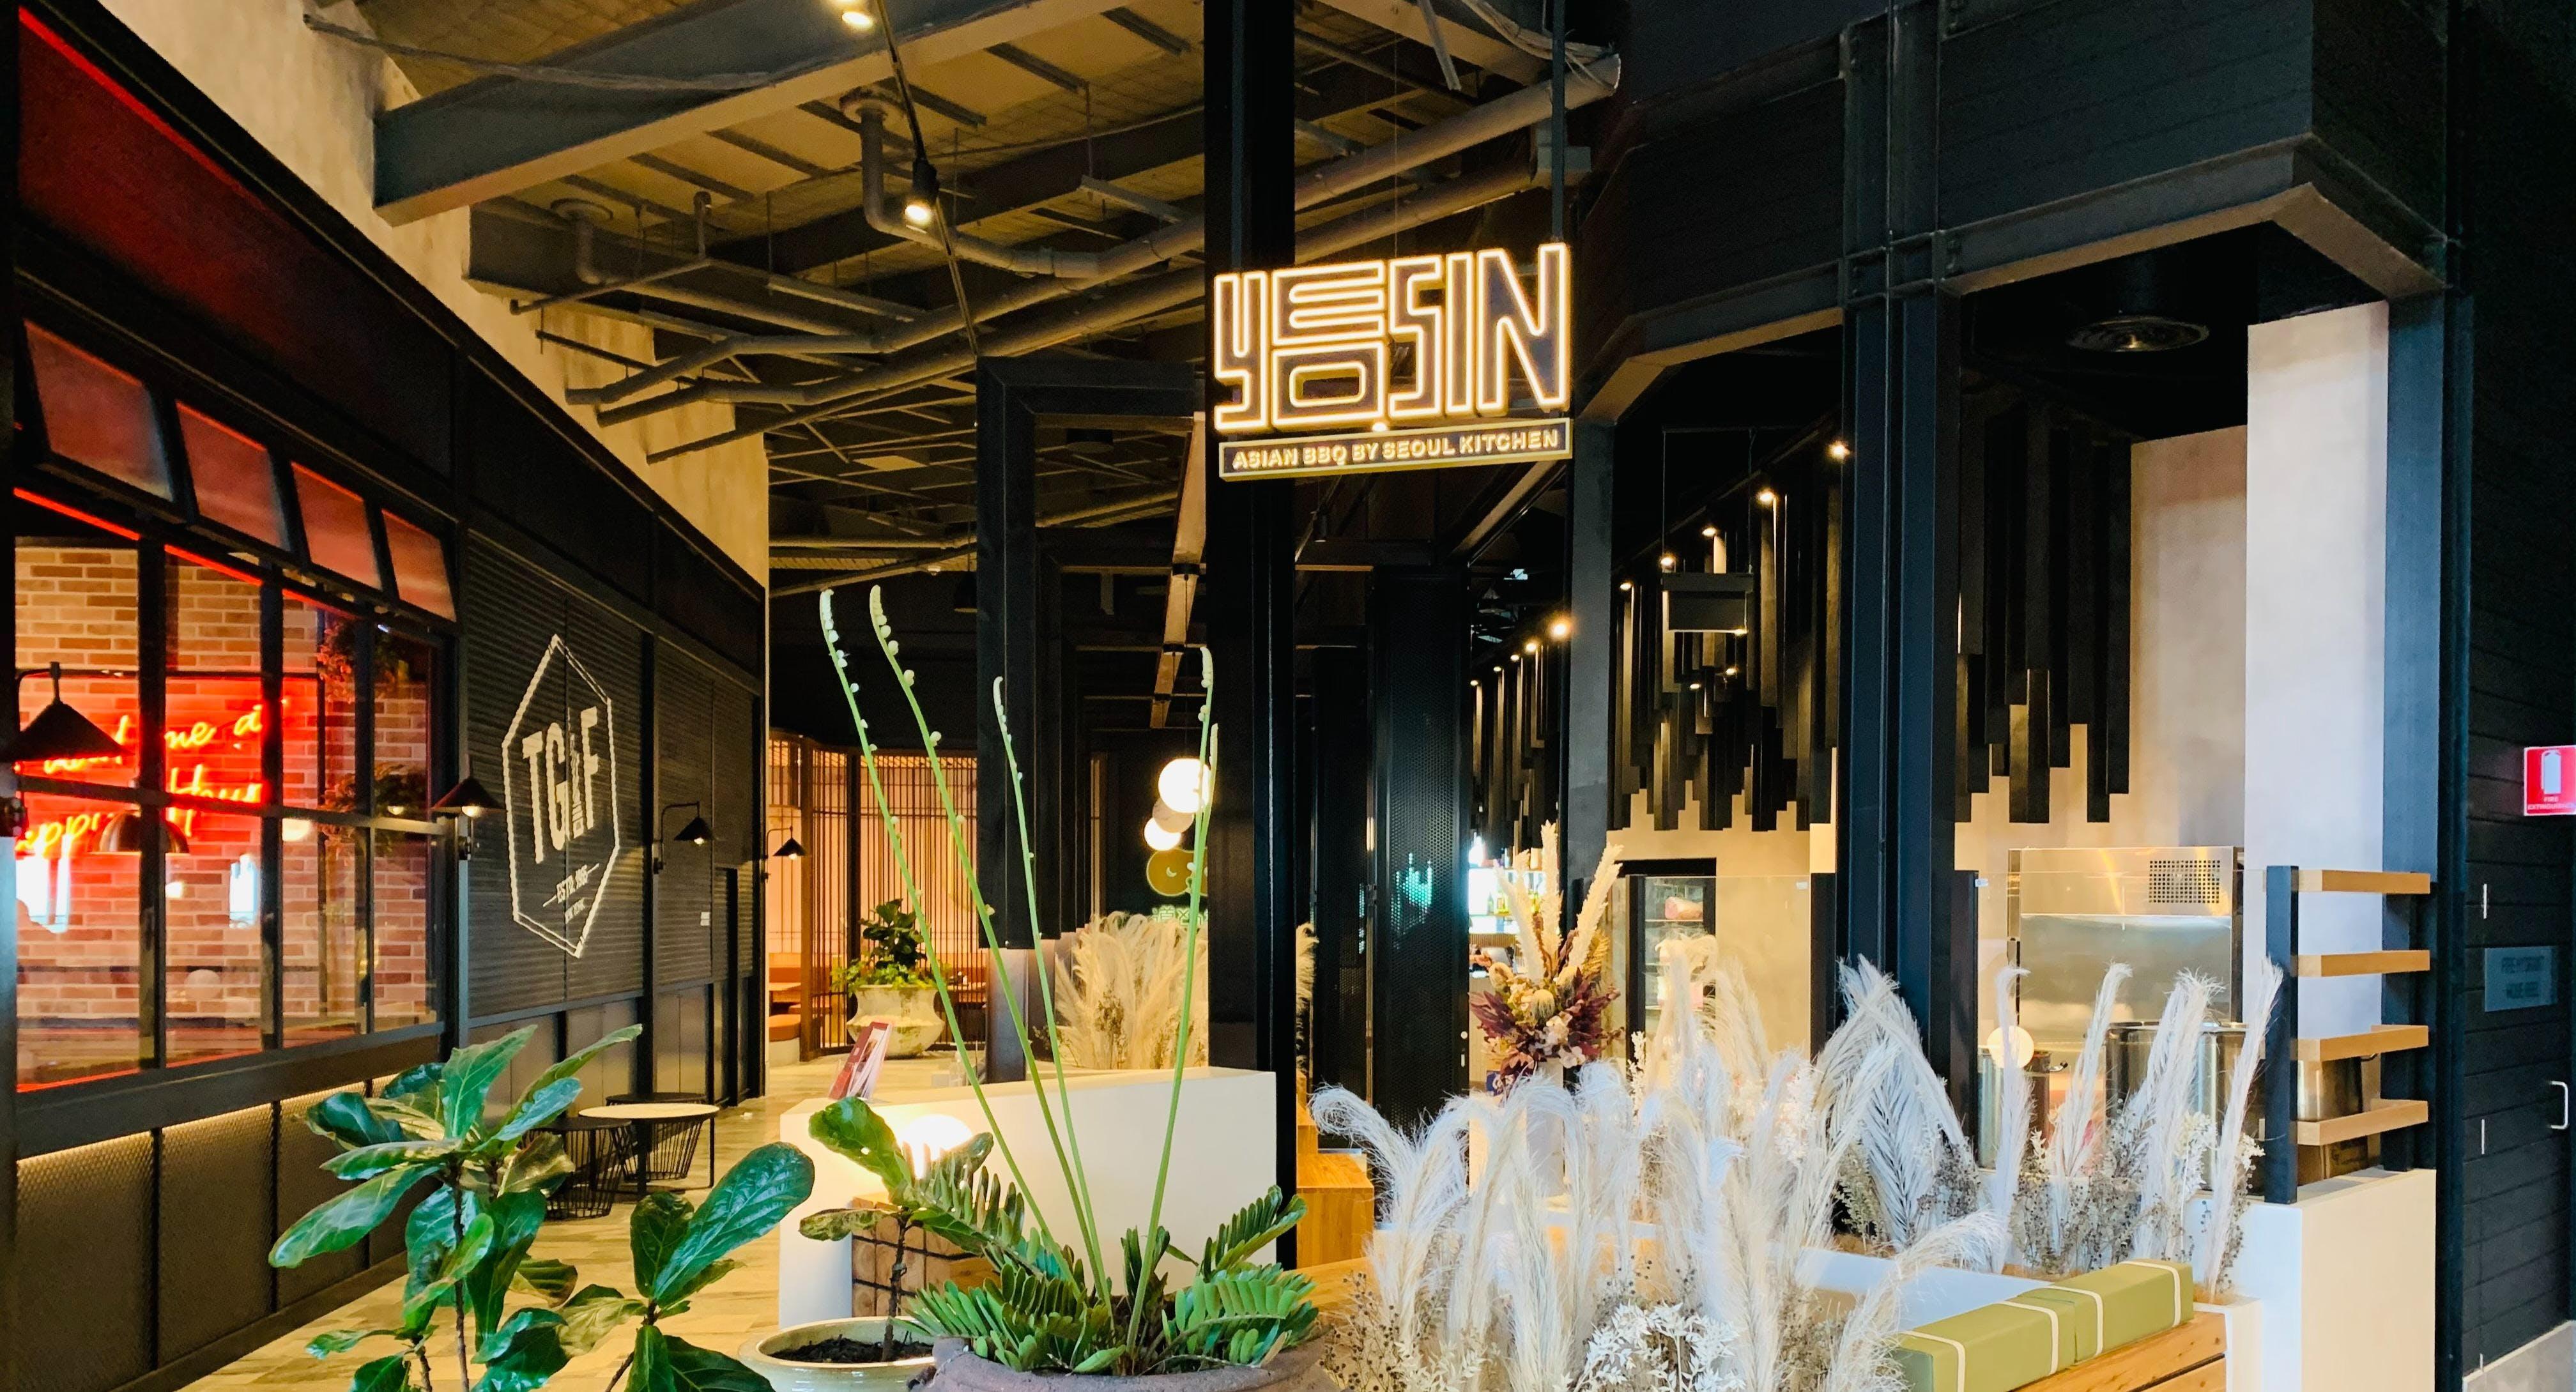 Photo of restaurant Yeosin in Doncaster, Melbourne